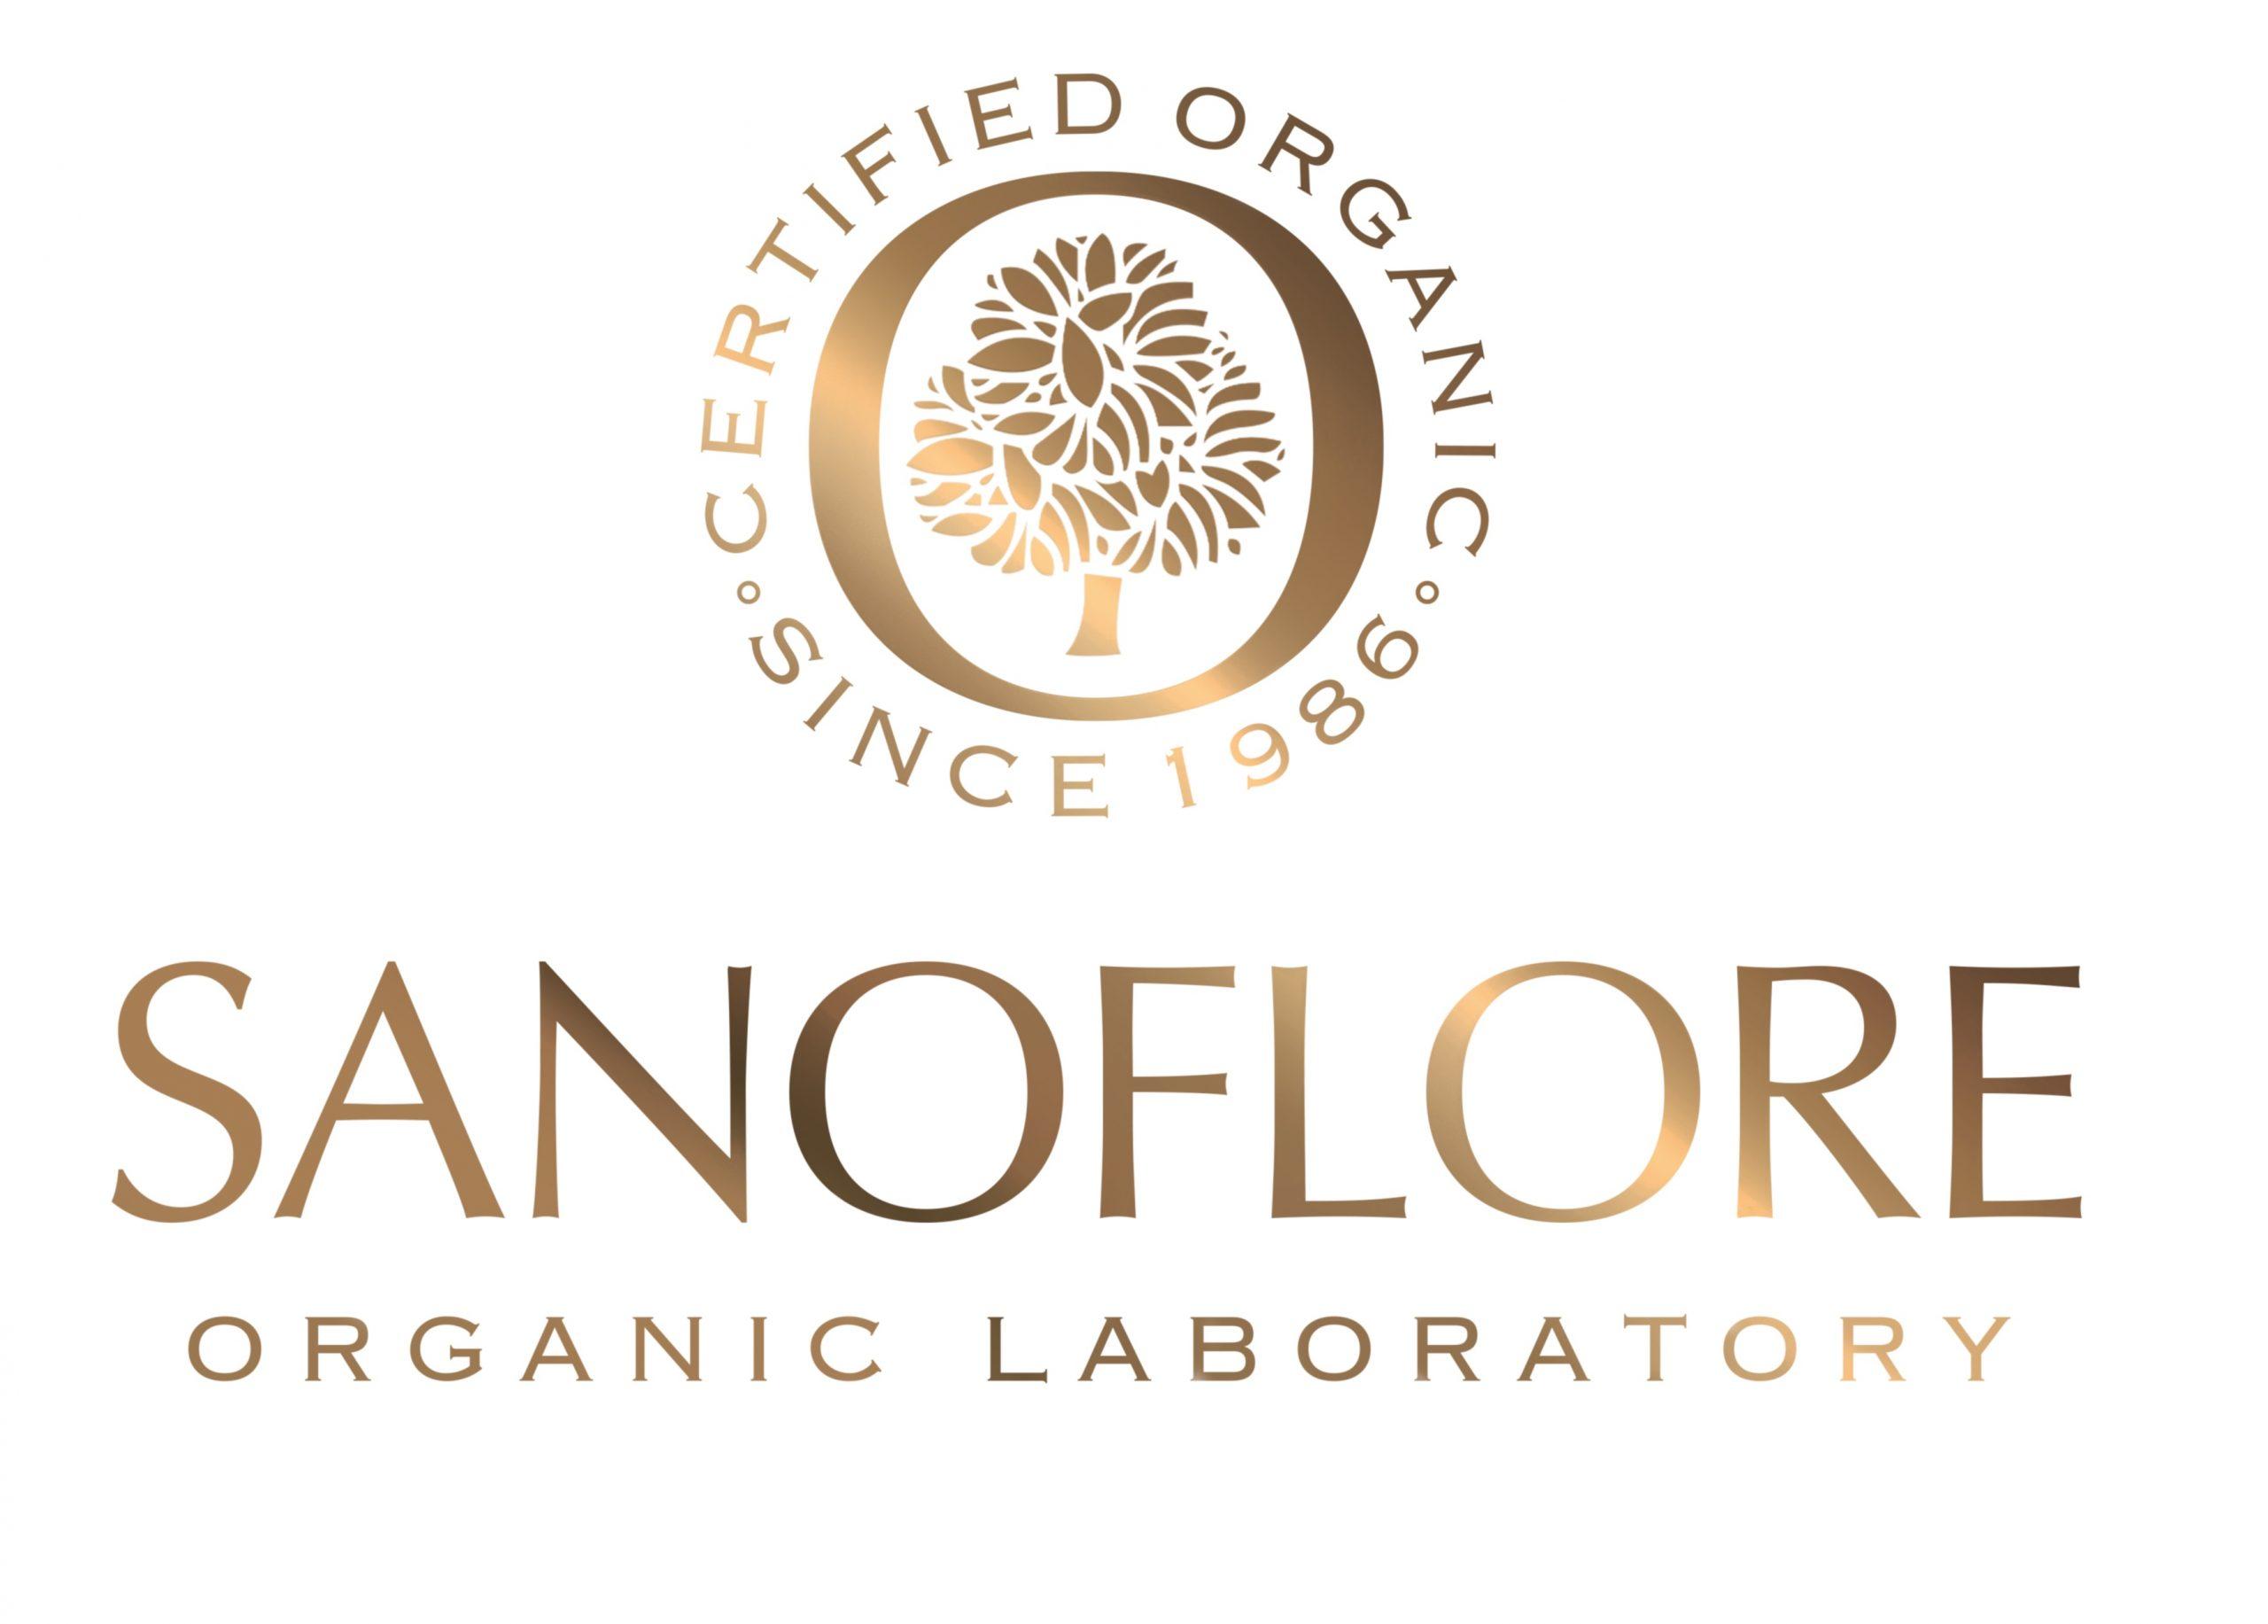 Sanoflore-logo-on-transparent